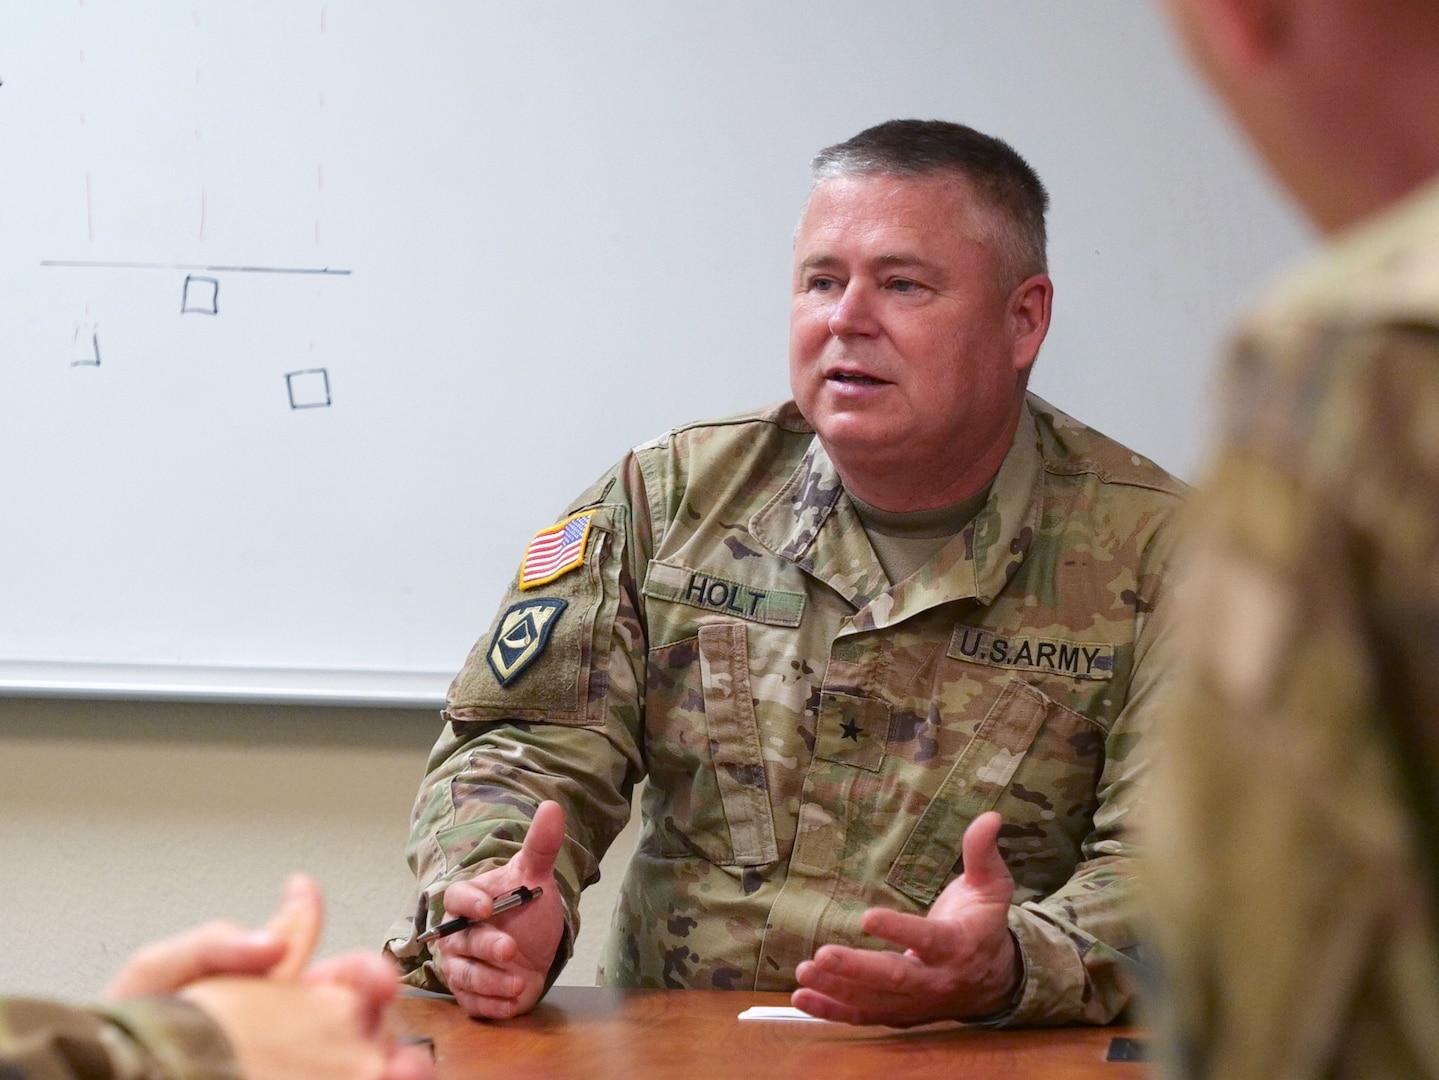 Brig. Gen. Holt visits WV Troops Prior to Middle East Deployment. (Courtesy photo provided)